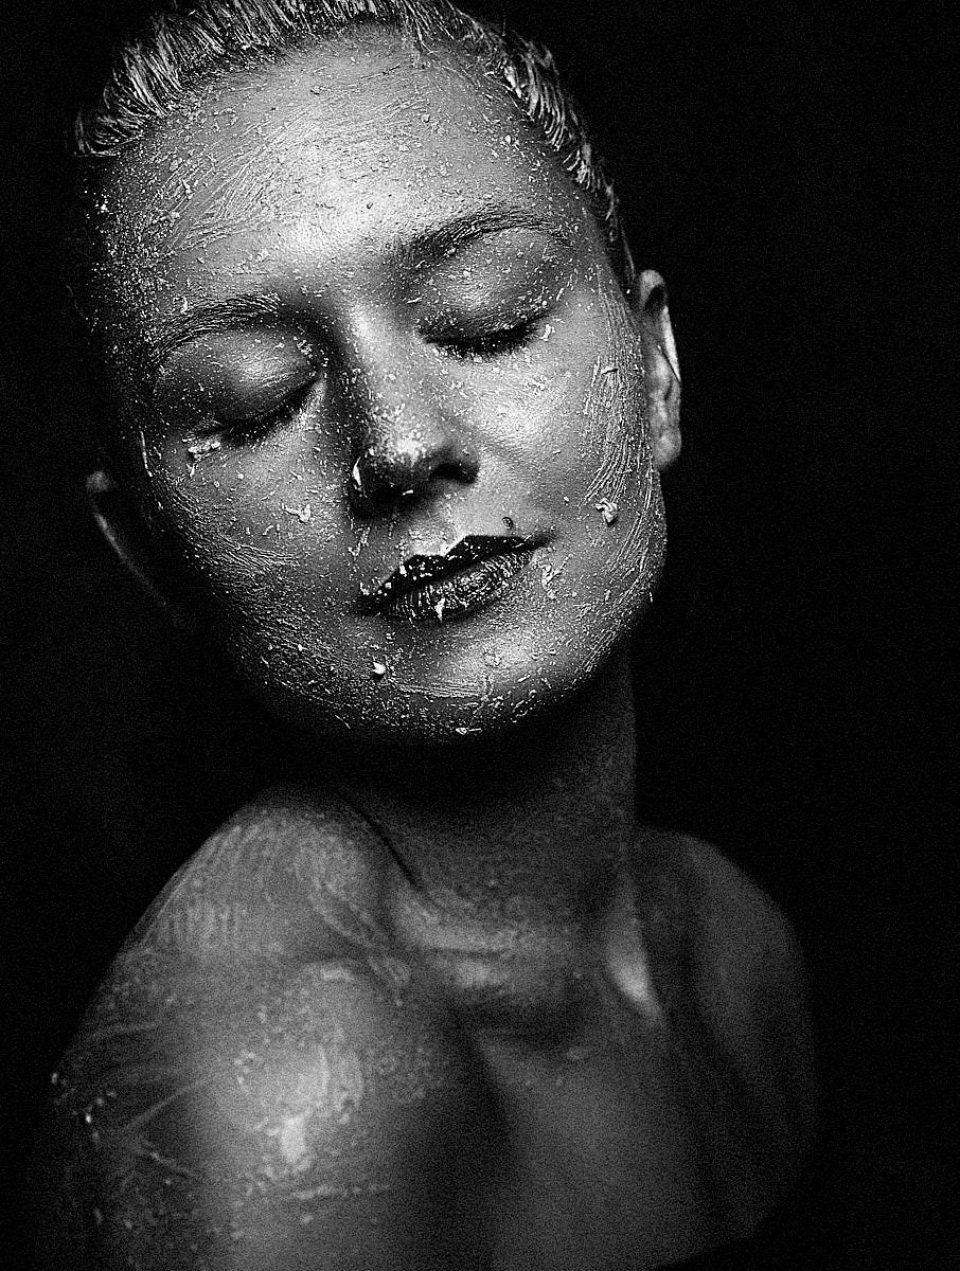 Portraitnoir Portrait Fotograf Ingolstadt Schwarzweiß Fotografie Beauty Fotografie